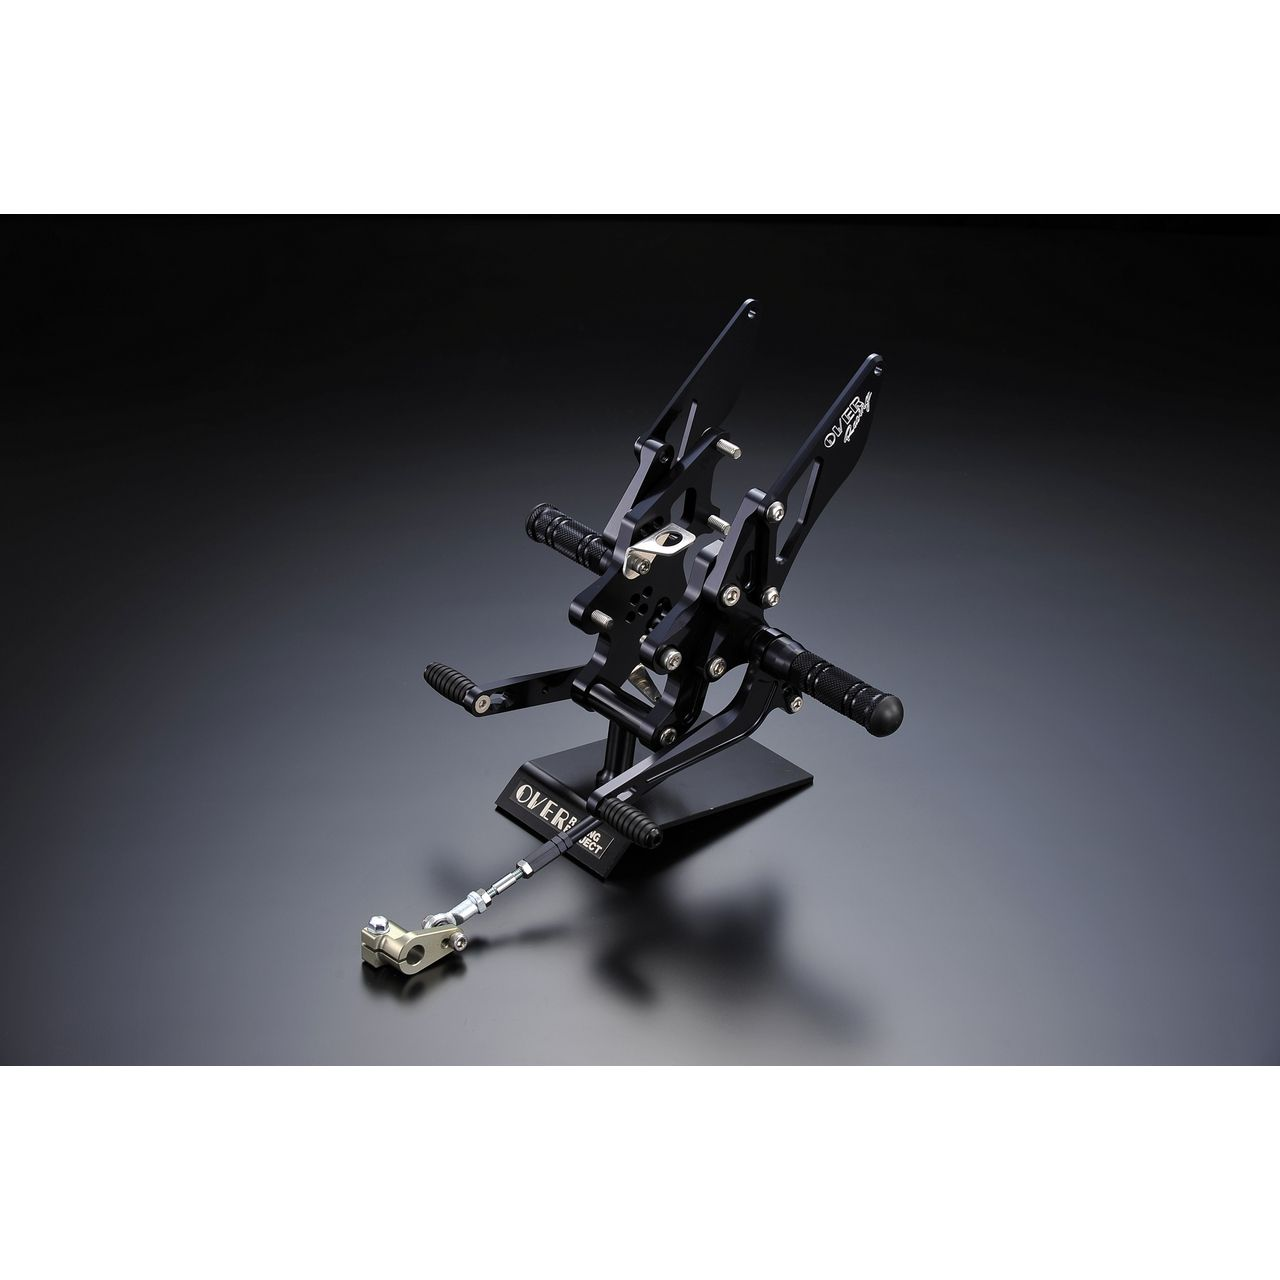 【OVER】腳踏後移套件 4點安裝位置 - 「Webike-摩托百貨」